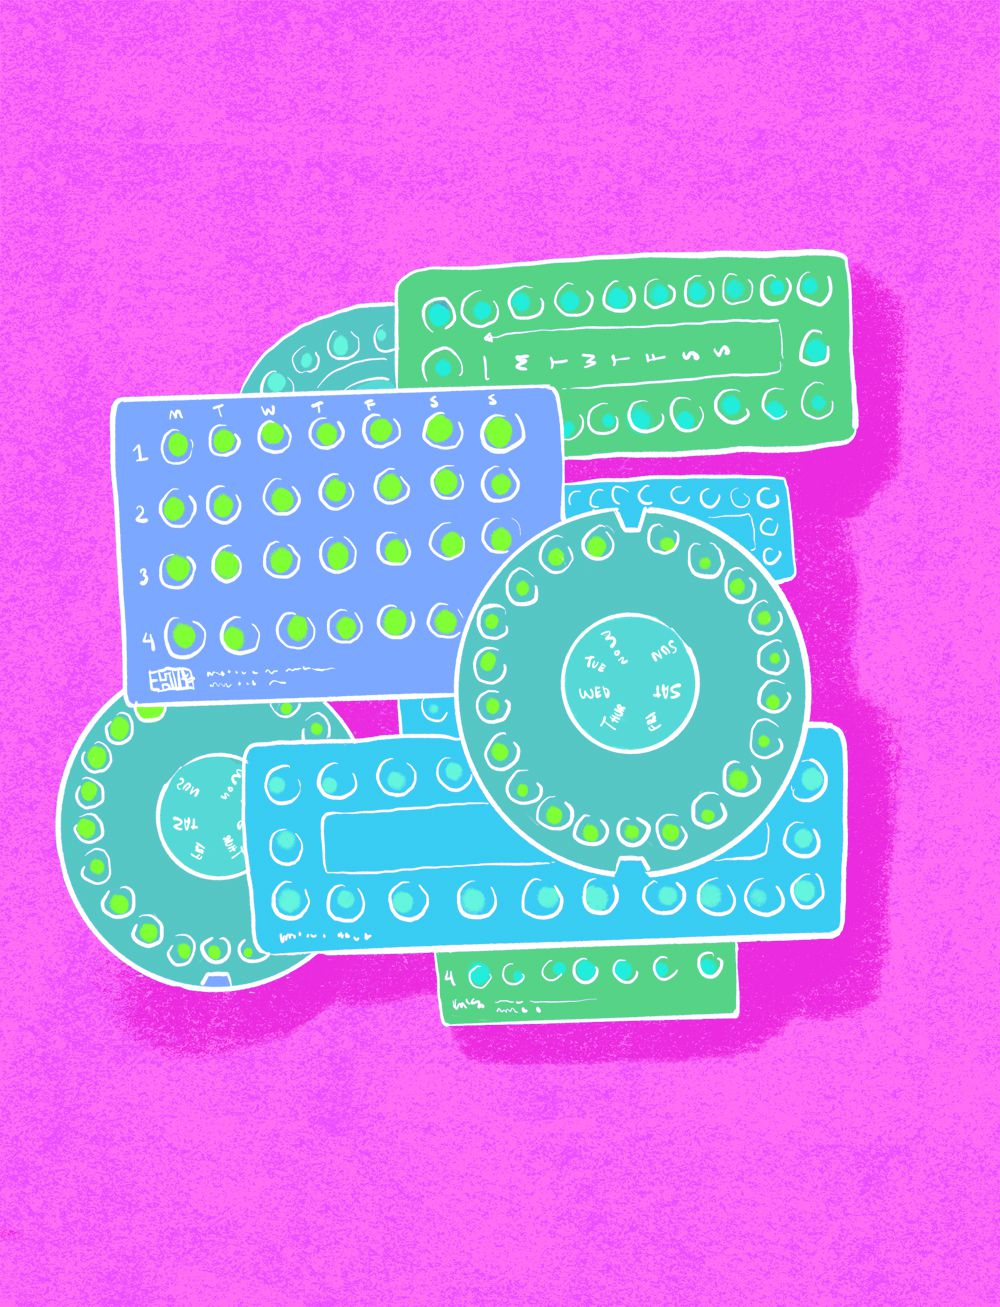 Several birth control pill packs